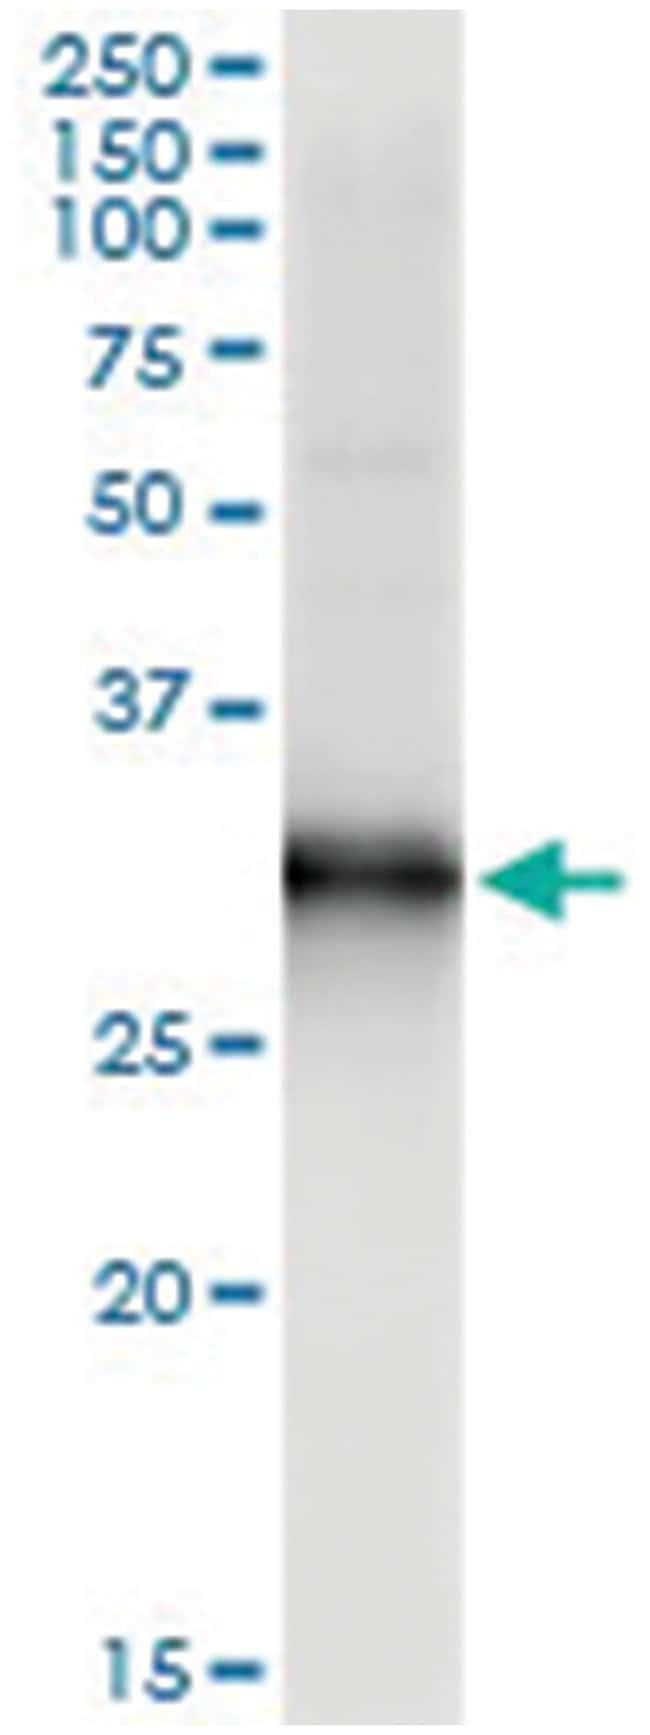 HOXB9, Human, IP-WB Antibody Pair (PW2), Abnova 1 Set:Antibodies